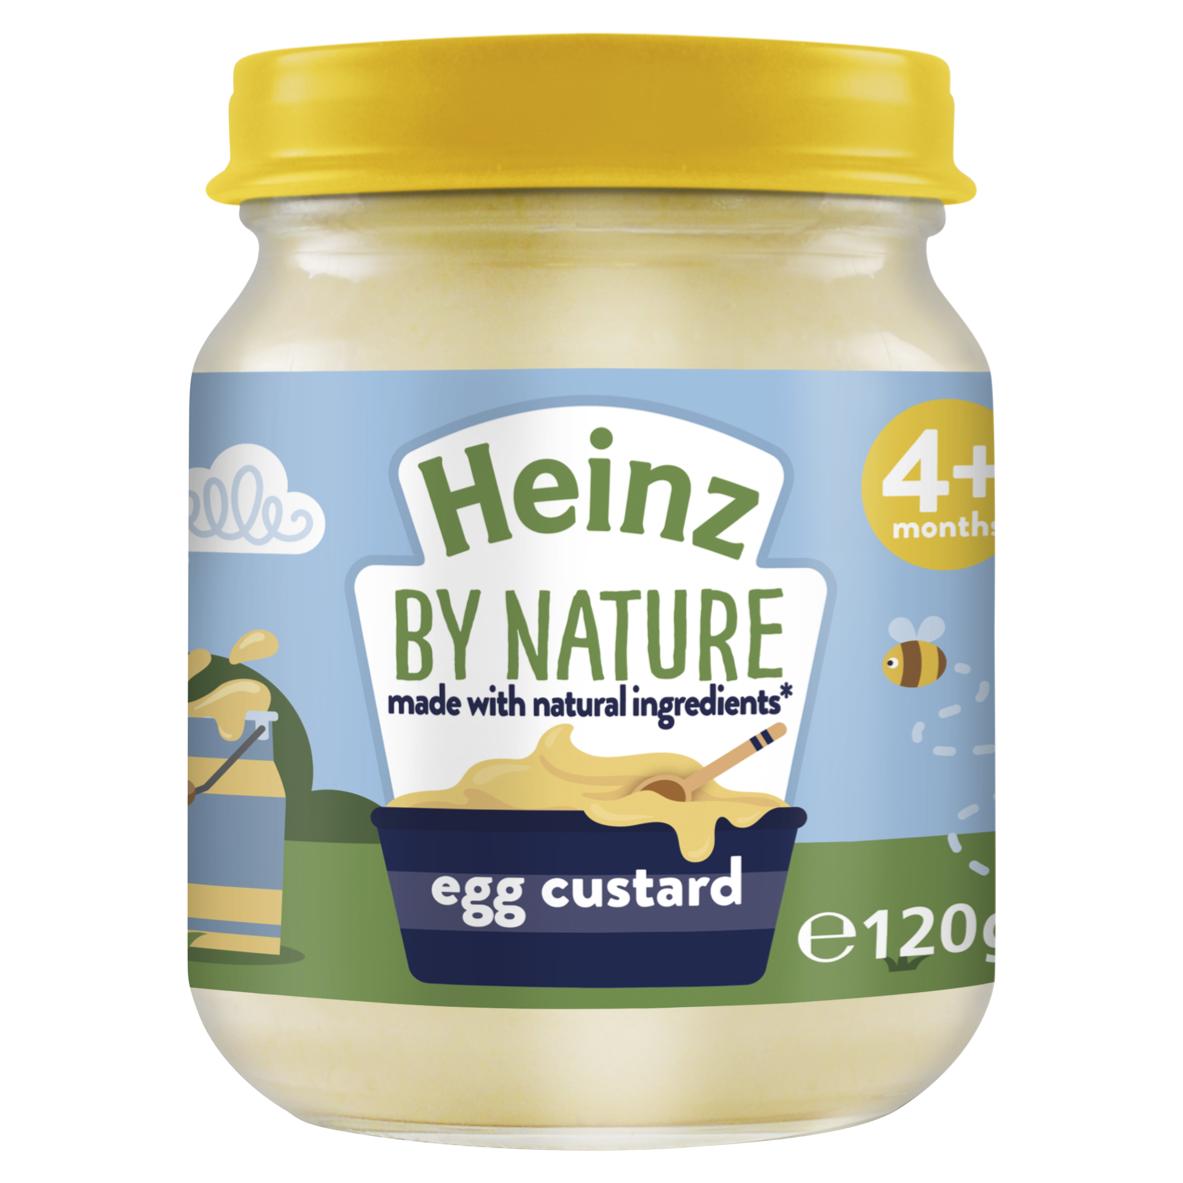 Photograph of 1x 6-pack Heinz Egg Custard 120g product